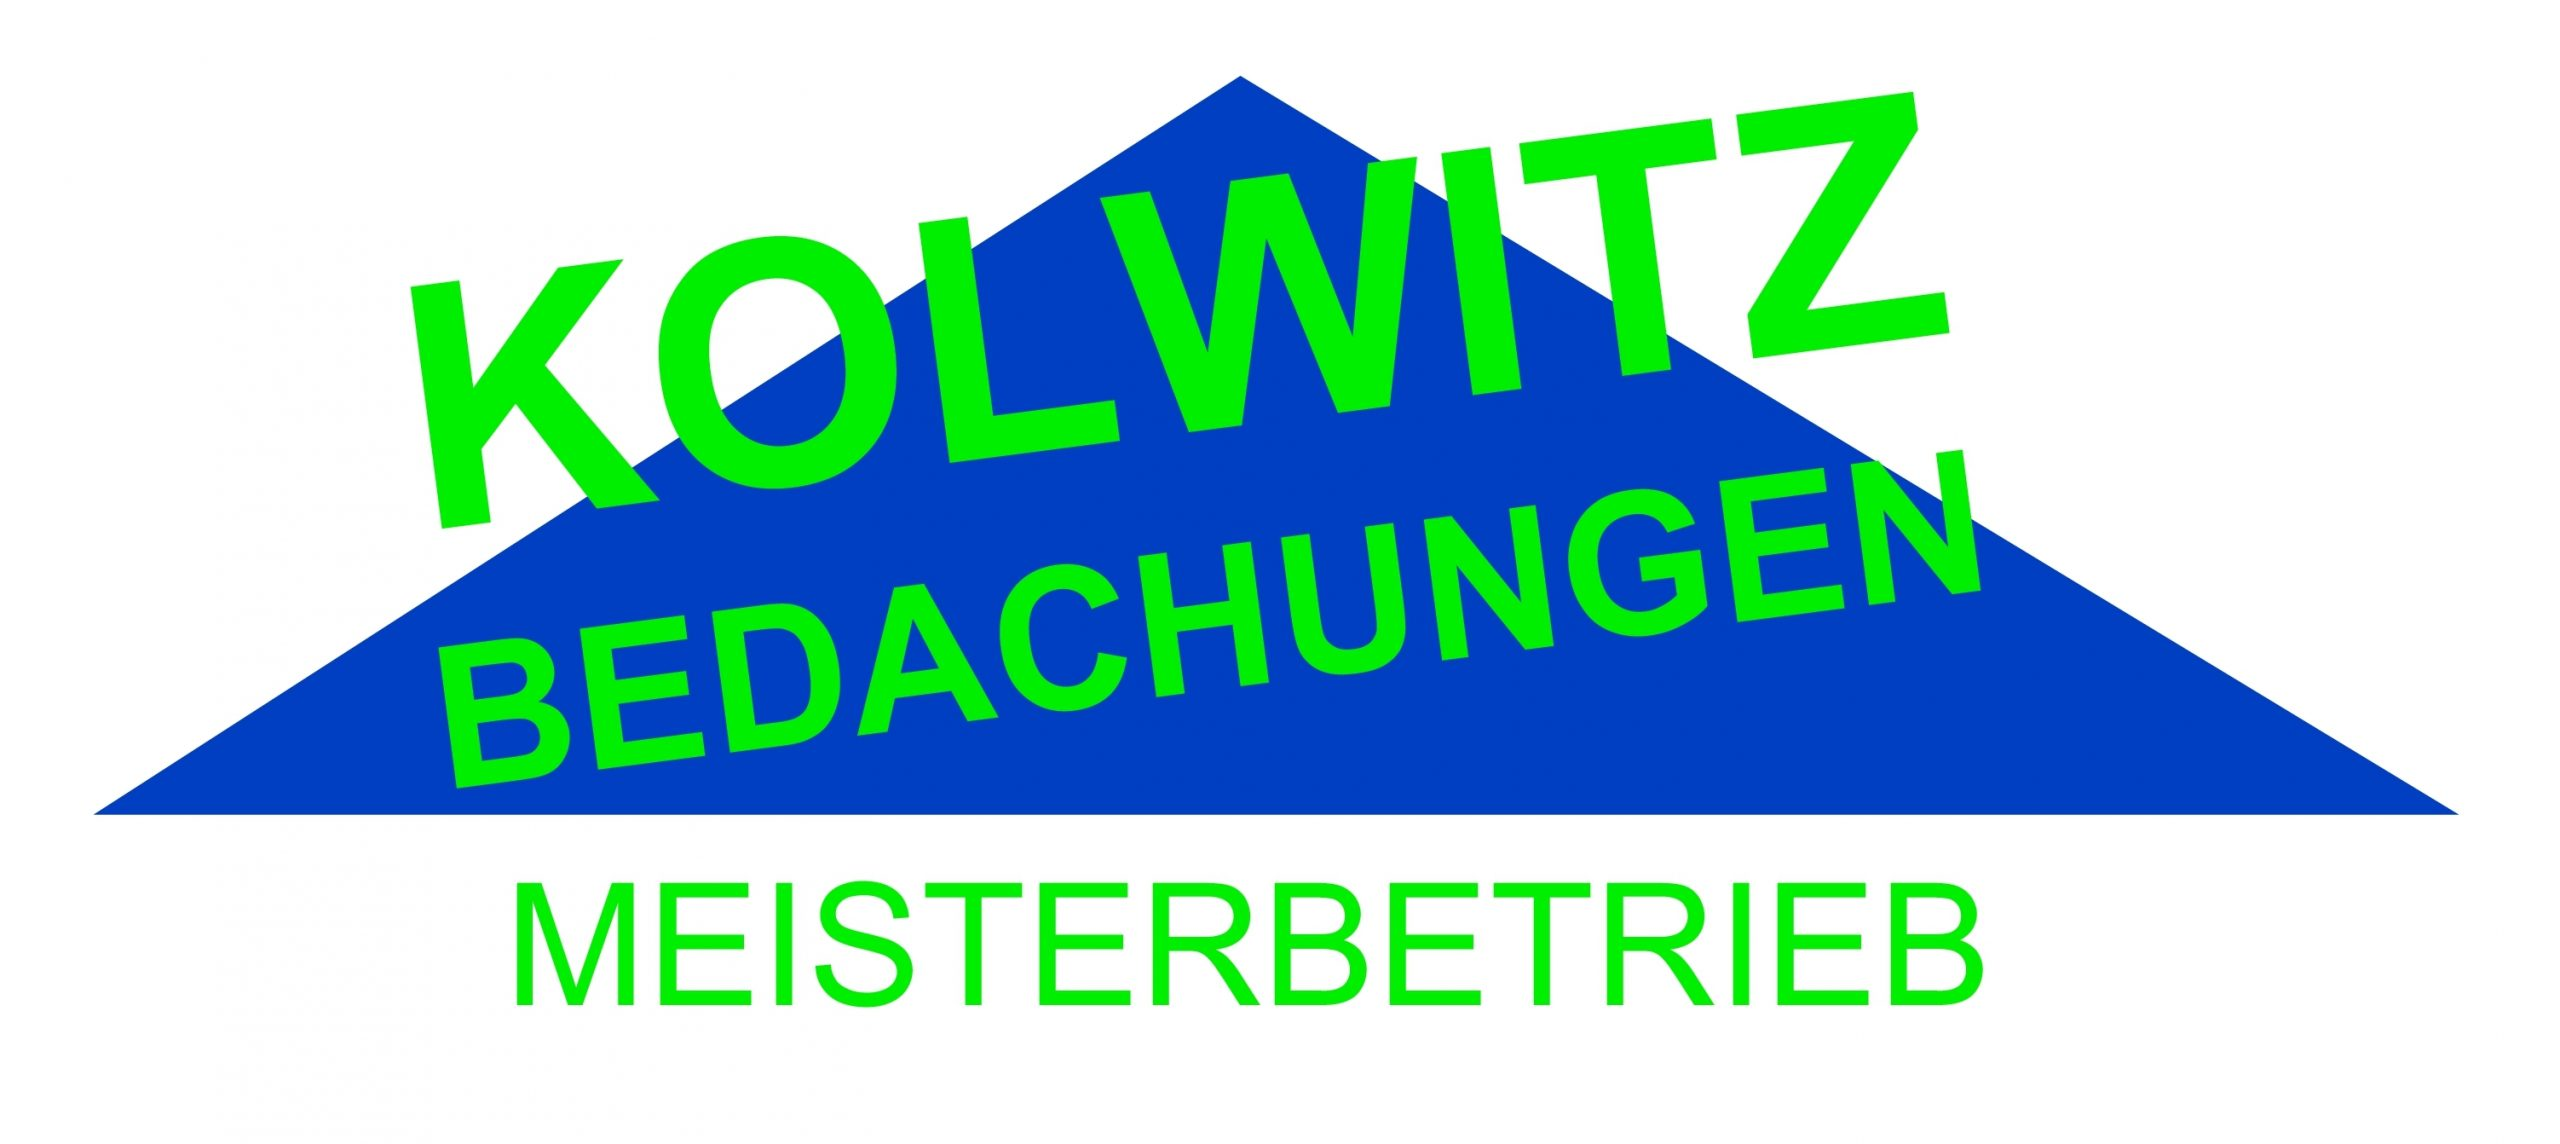 Bedachungen Kolwitz